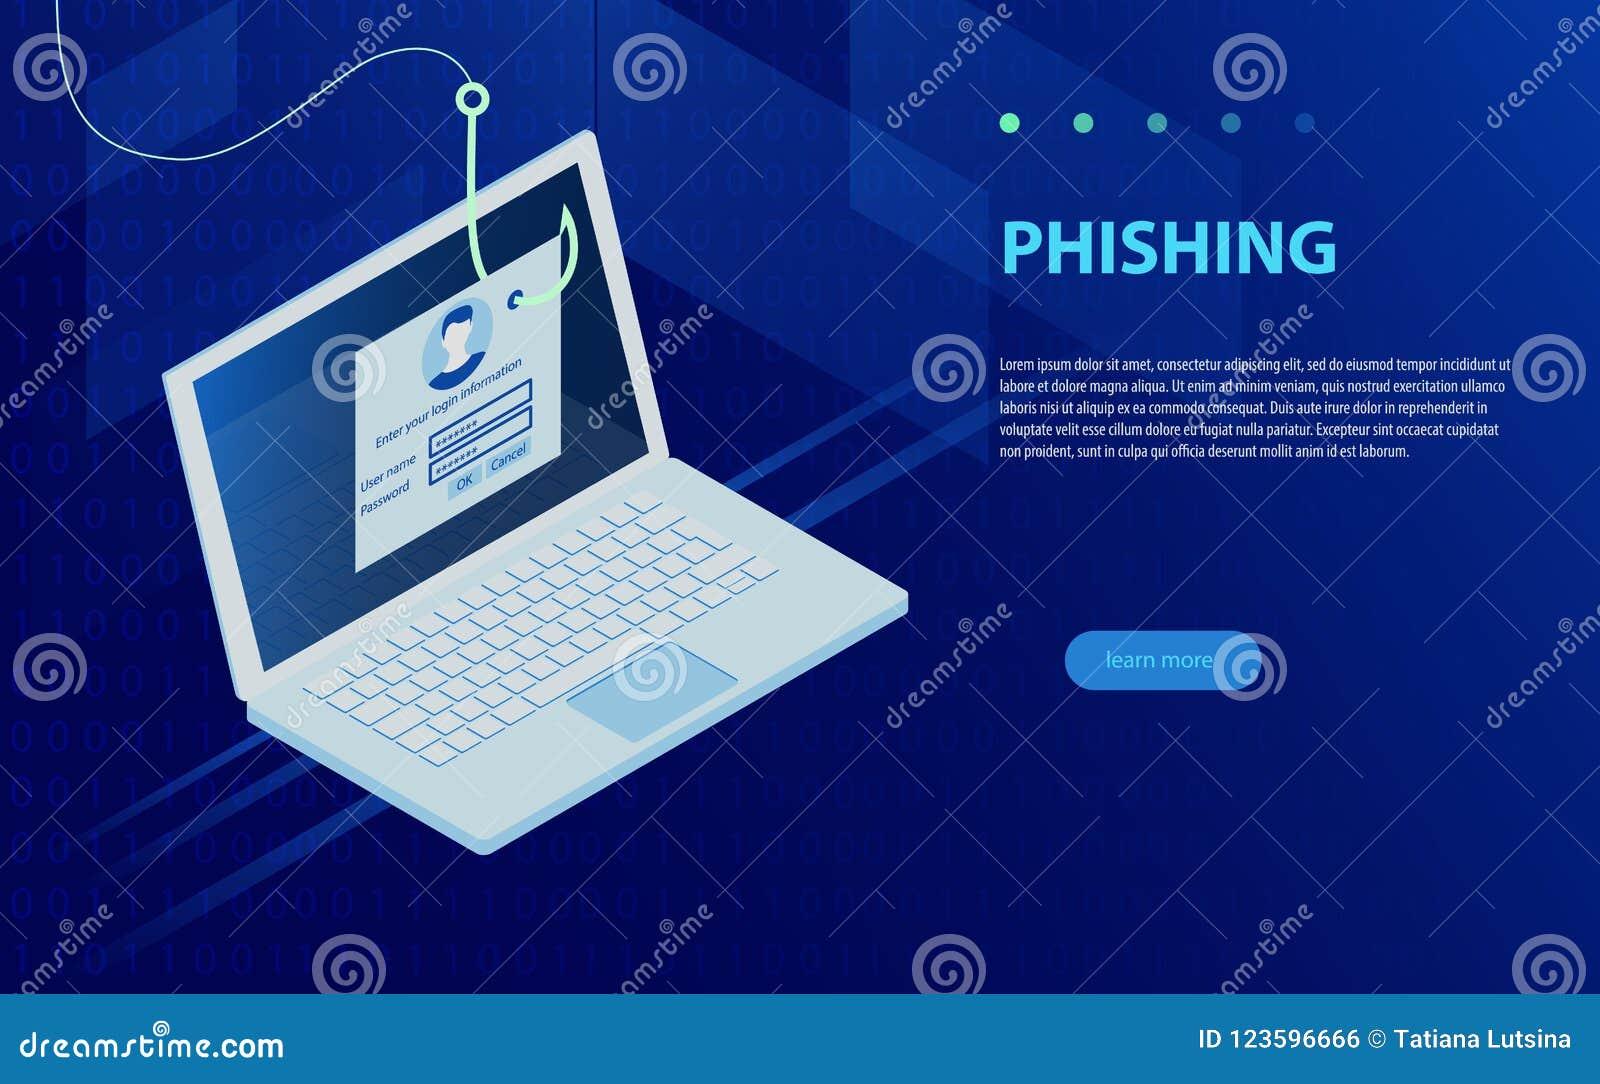 Login Into Account And Fishing Hook  Internet Phishing